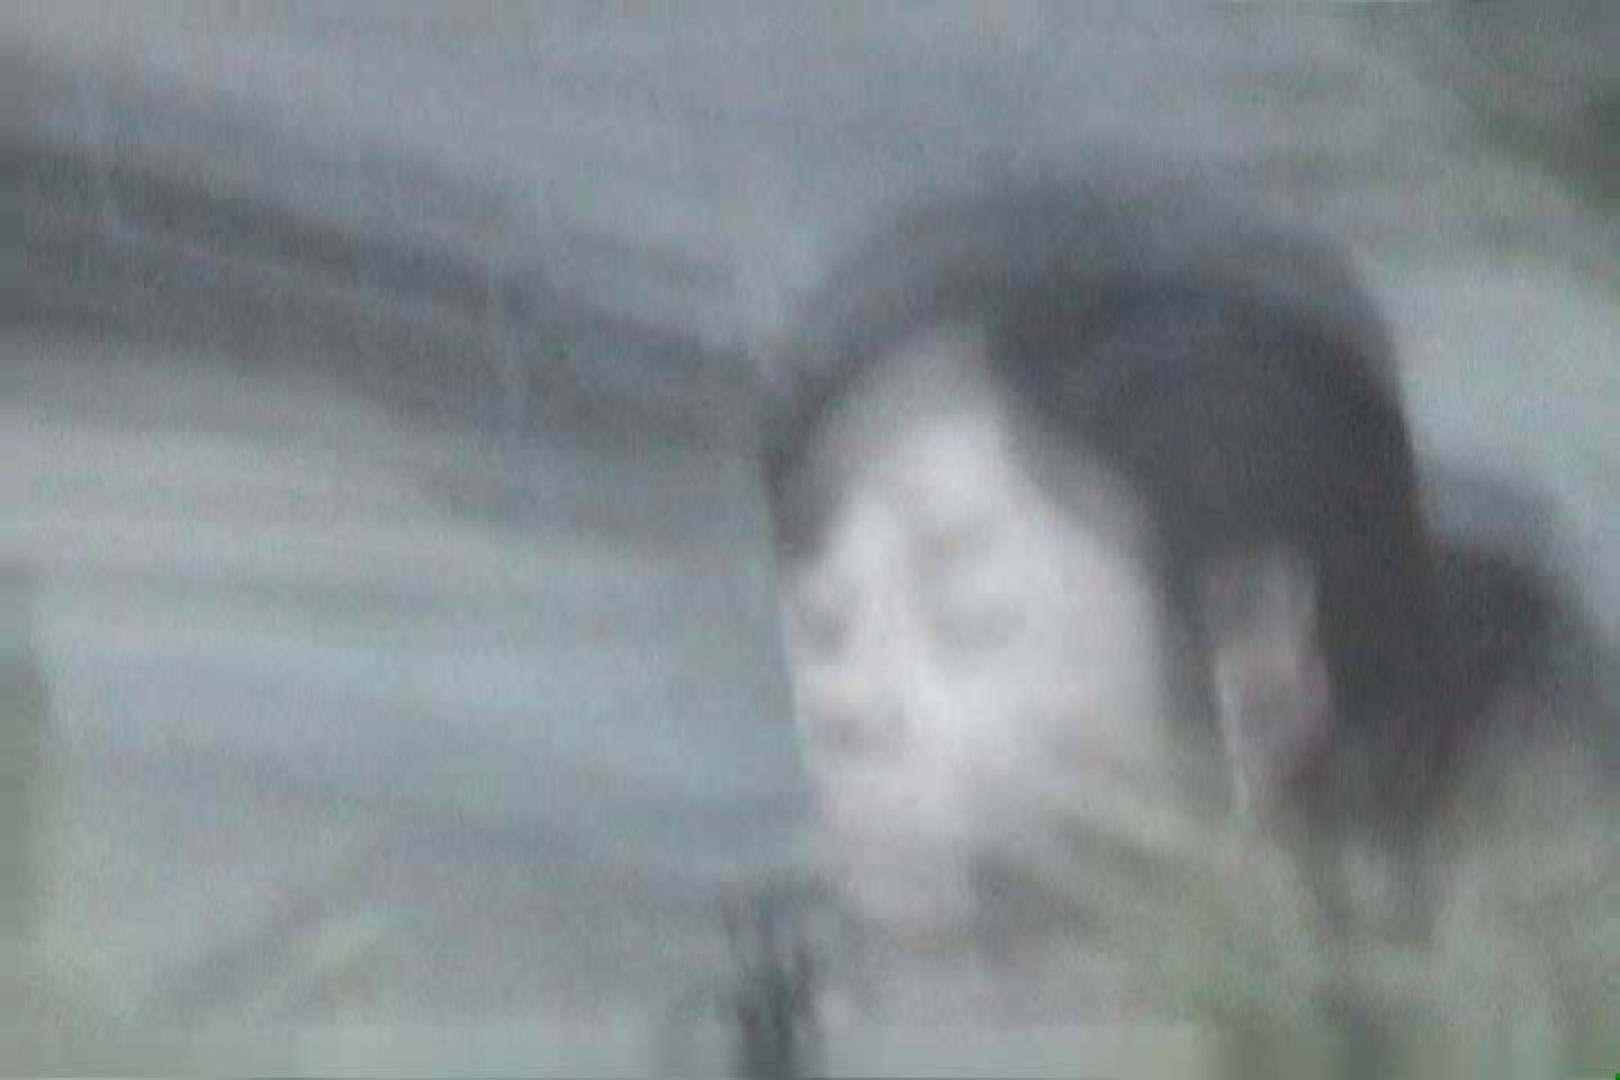 Aquaな露天風呂Vol.609 盗撮シリーズ   露天風呂編  107PIX 29